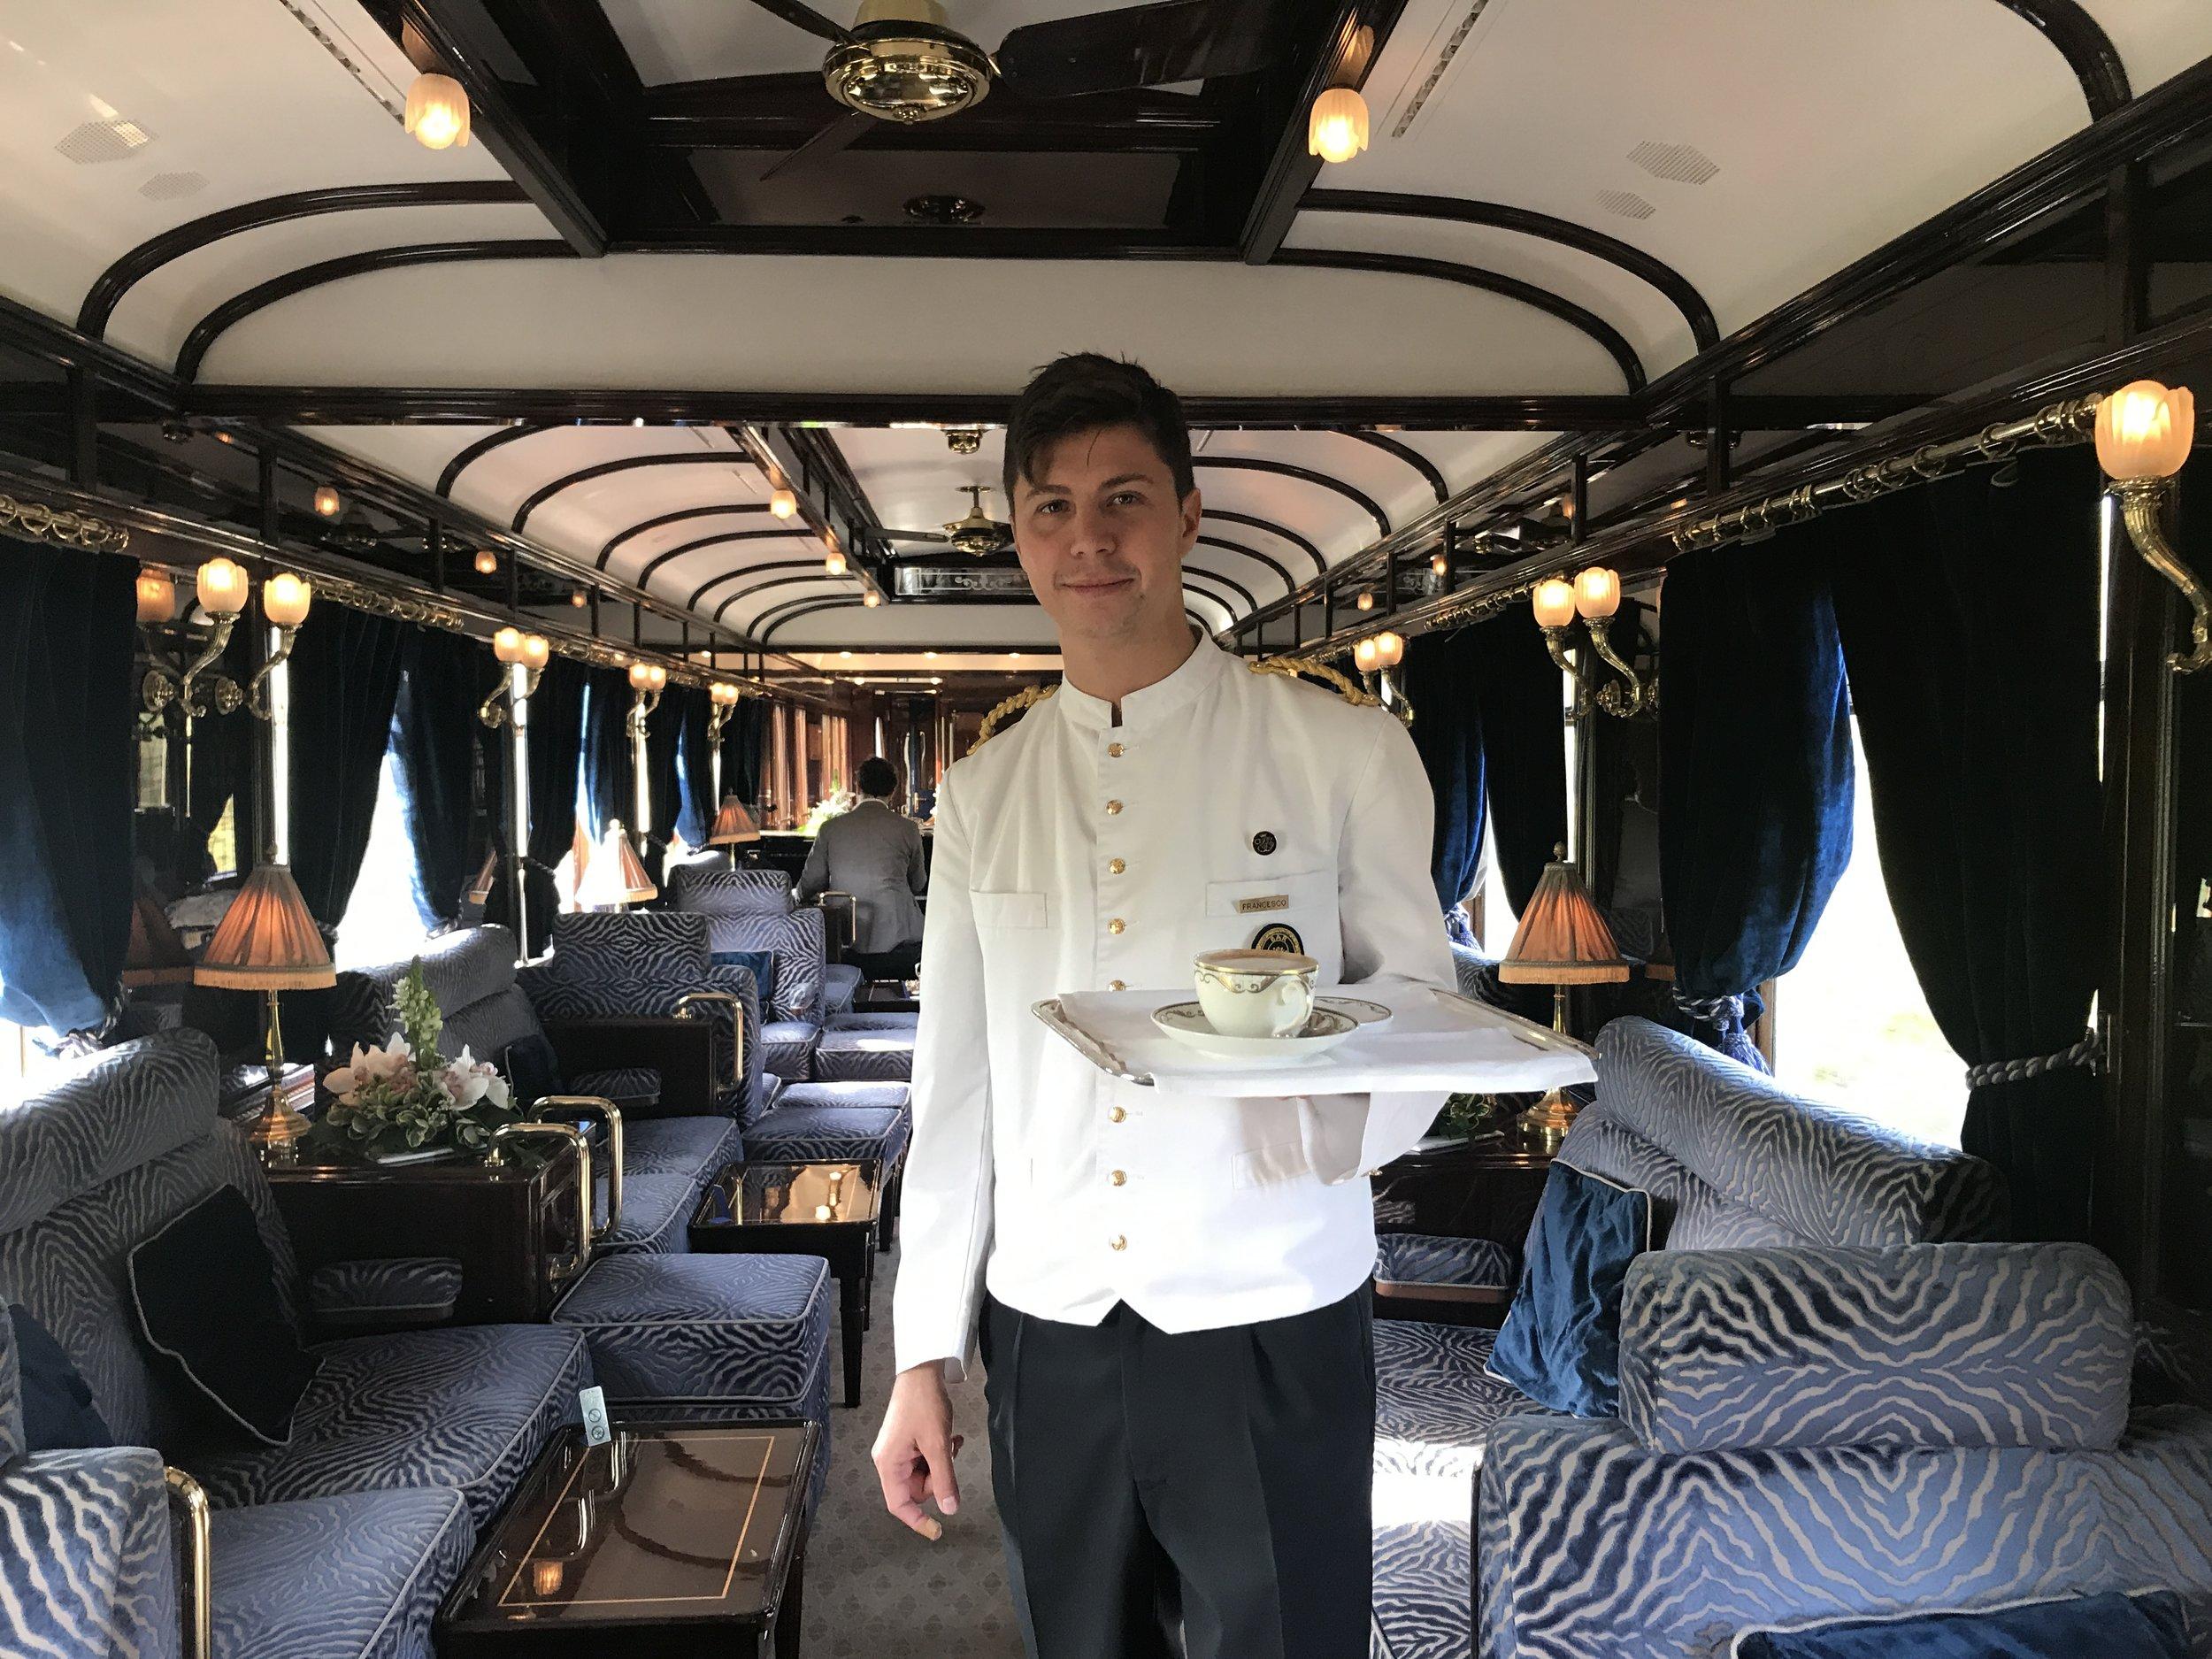 Elegant service